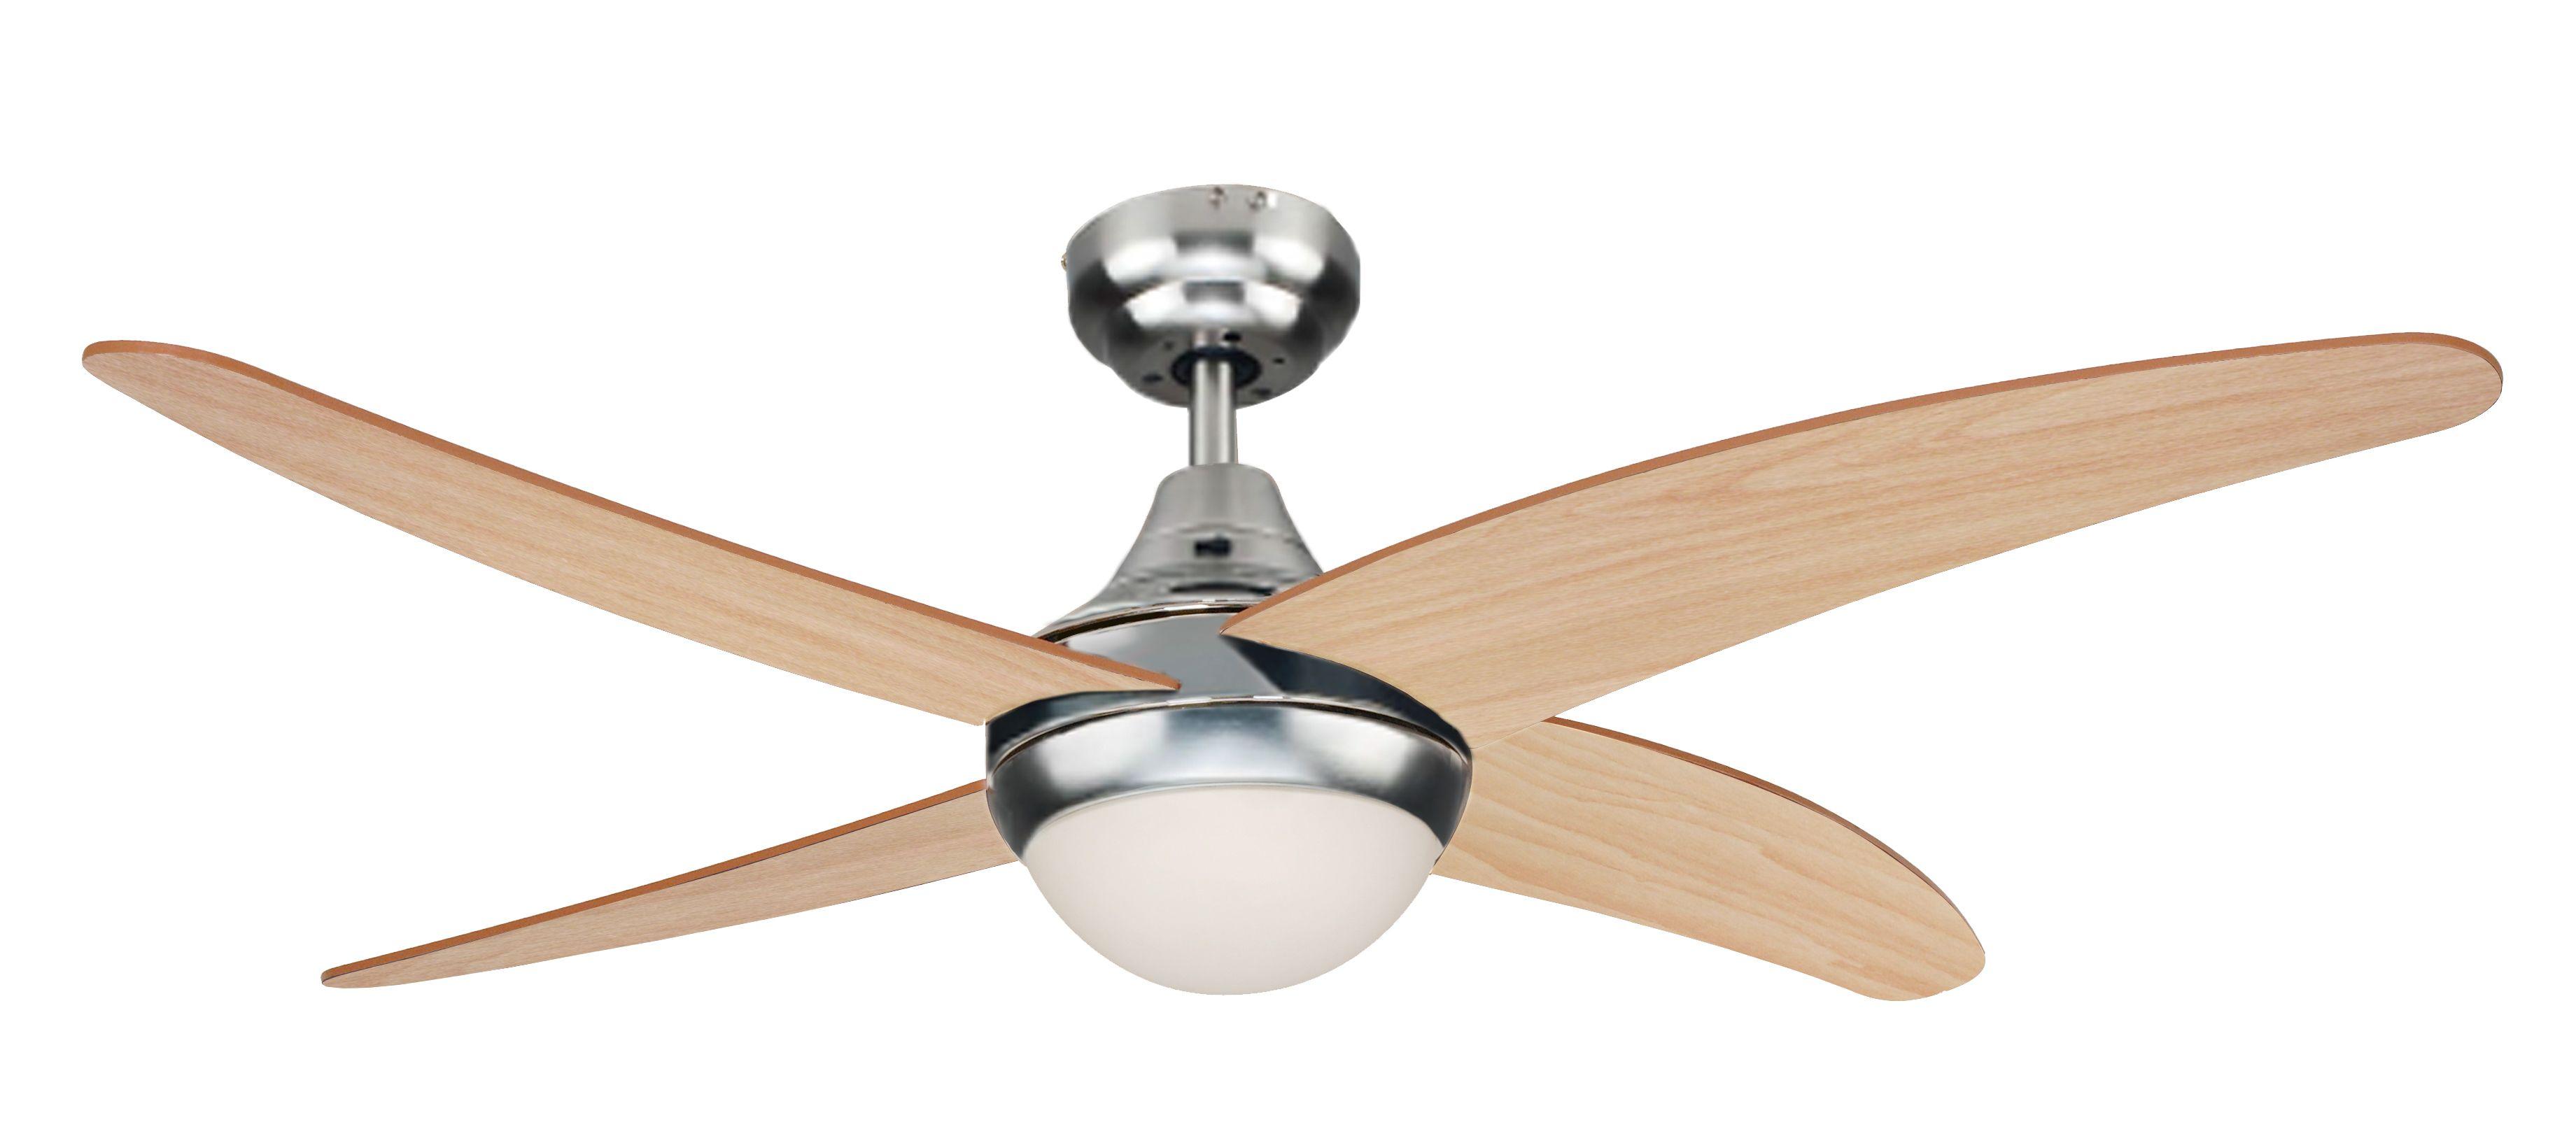 Ceiling Fan Achilia 105cm 41 With